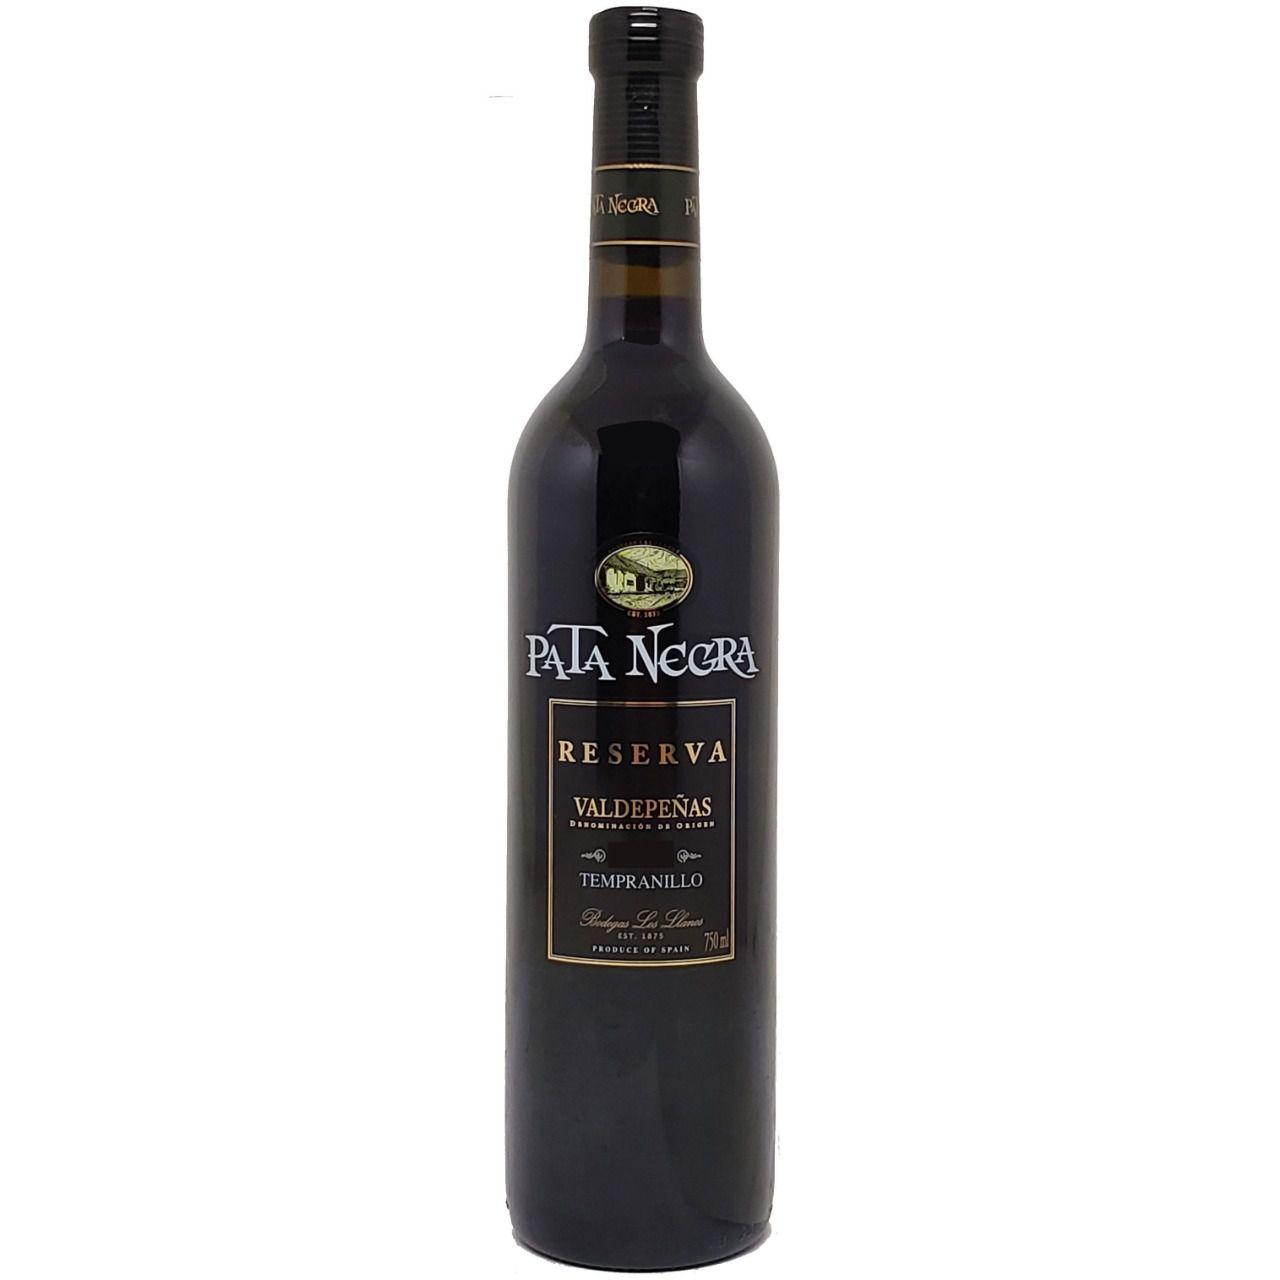 Vinho Tinto Pata Negra Tempranillo Reserva Valdepeñas - 750ml -